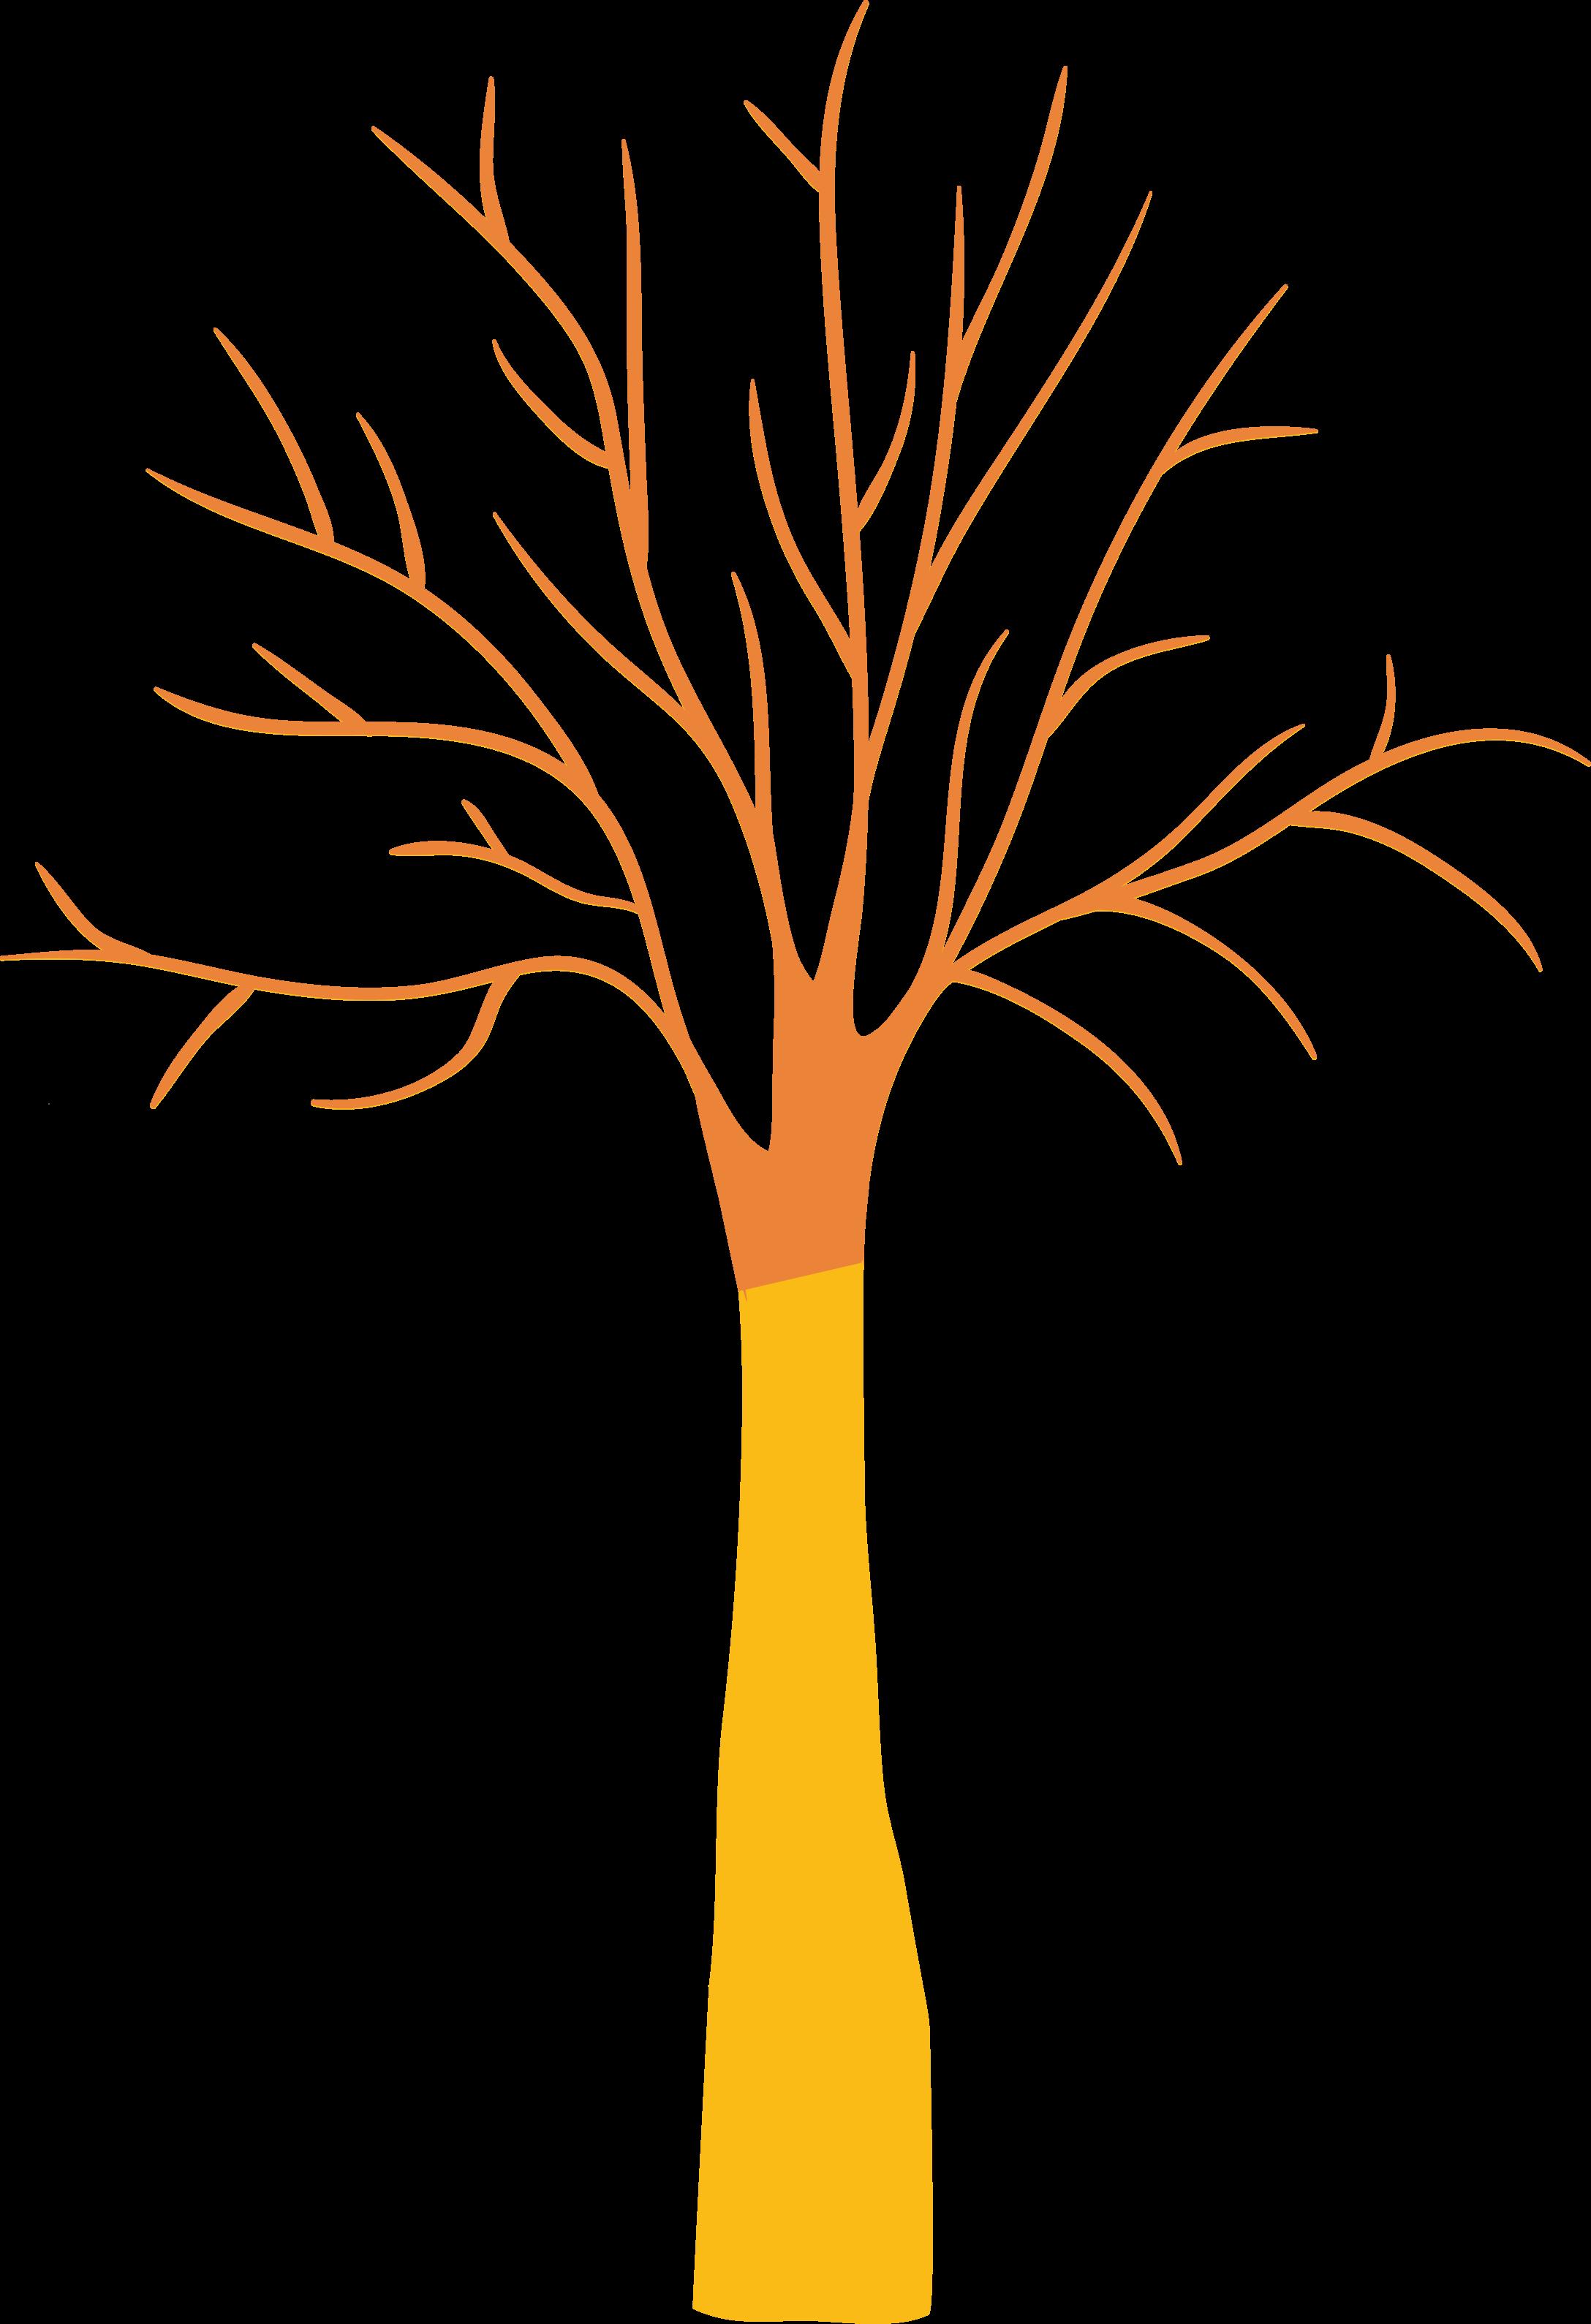 arbre-utilisation